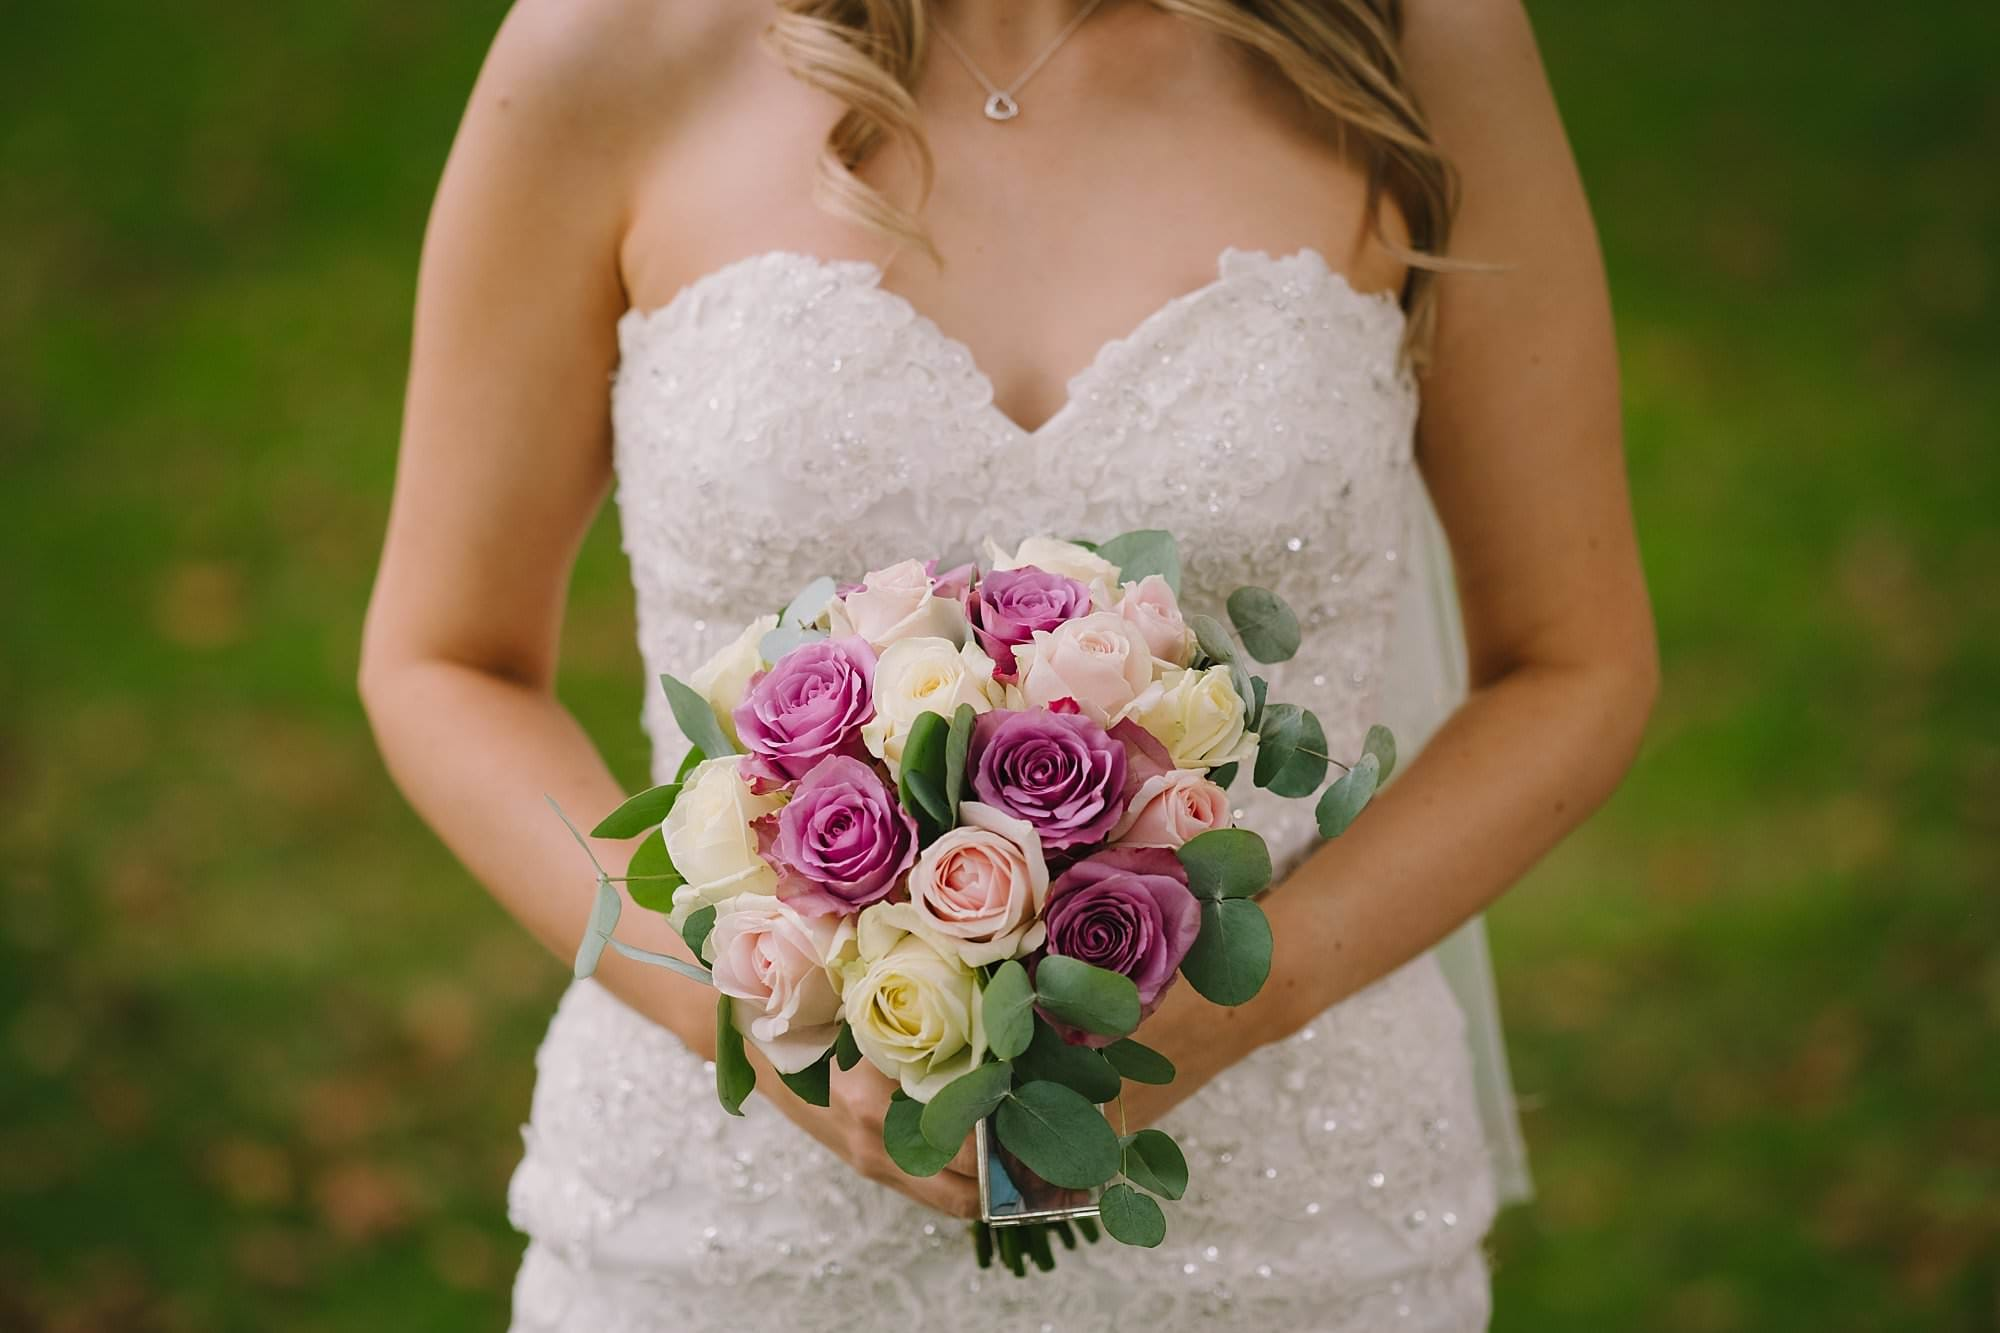 london pub wedding photographer jn 031 - The County Arms Wedding Photographer   Jen & Nick